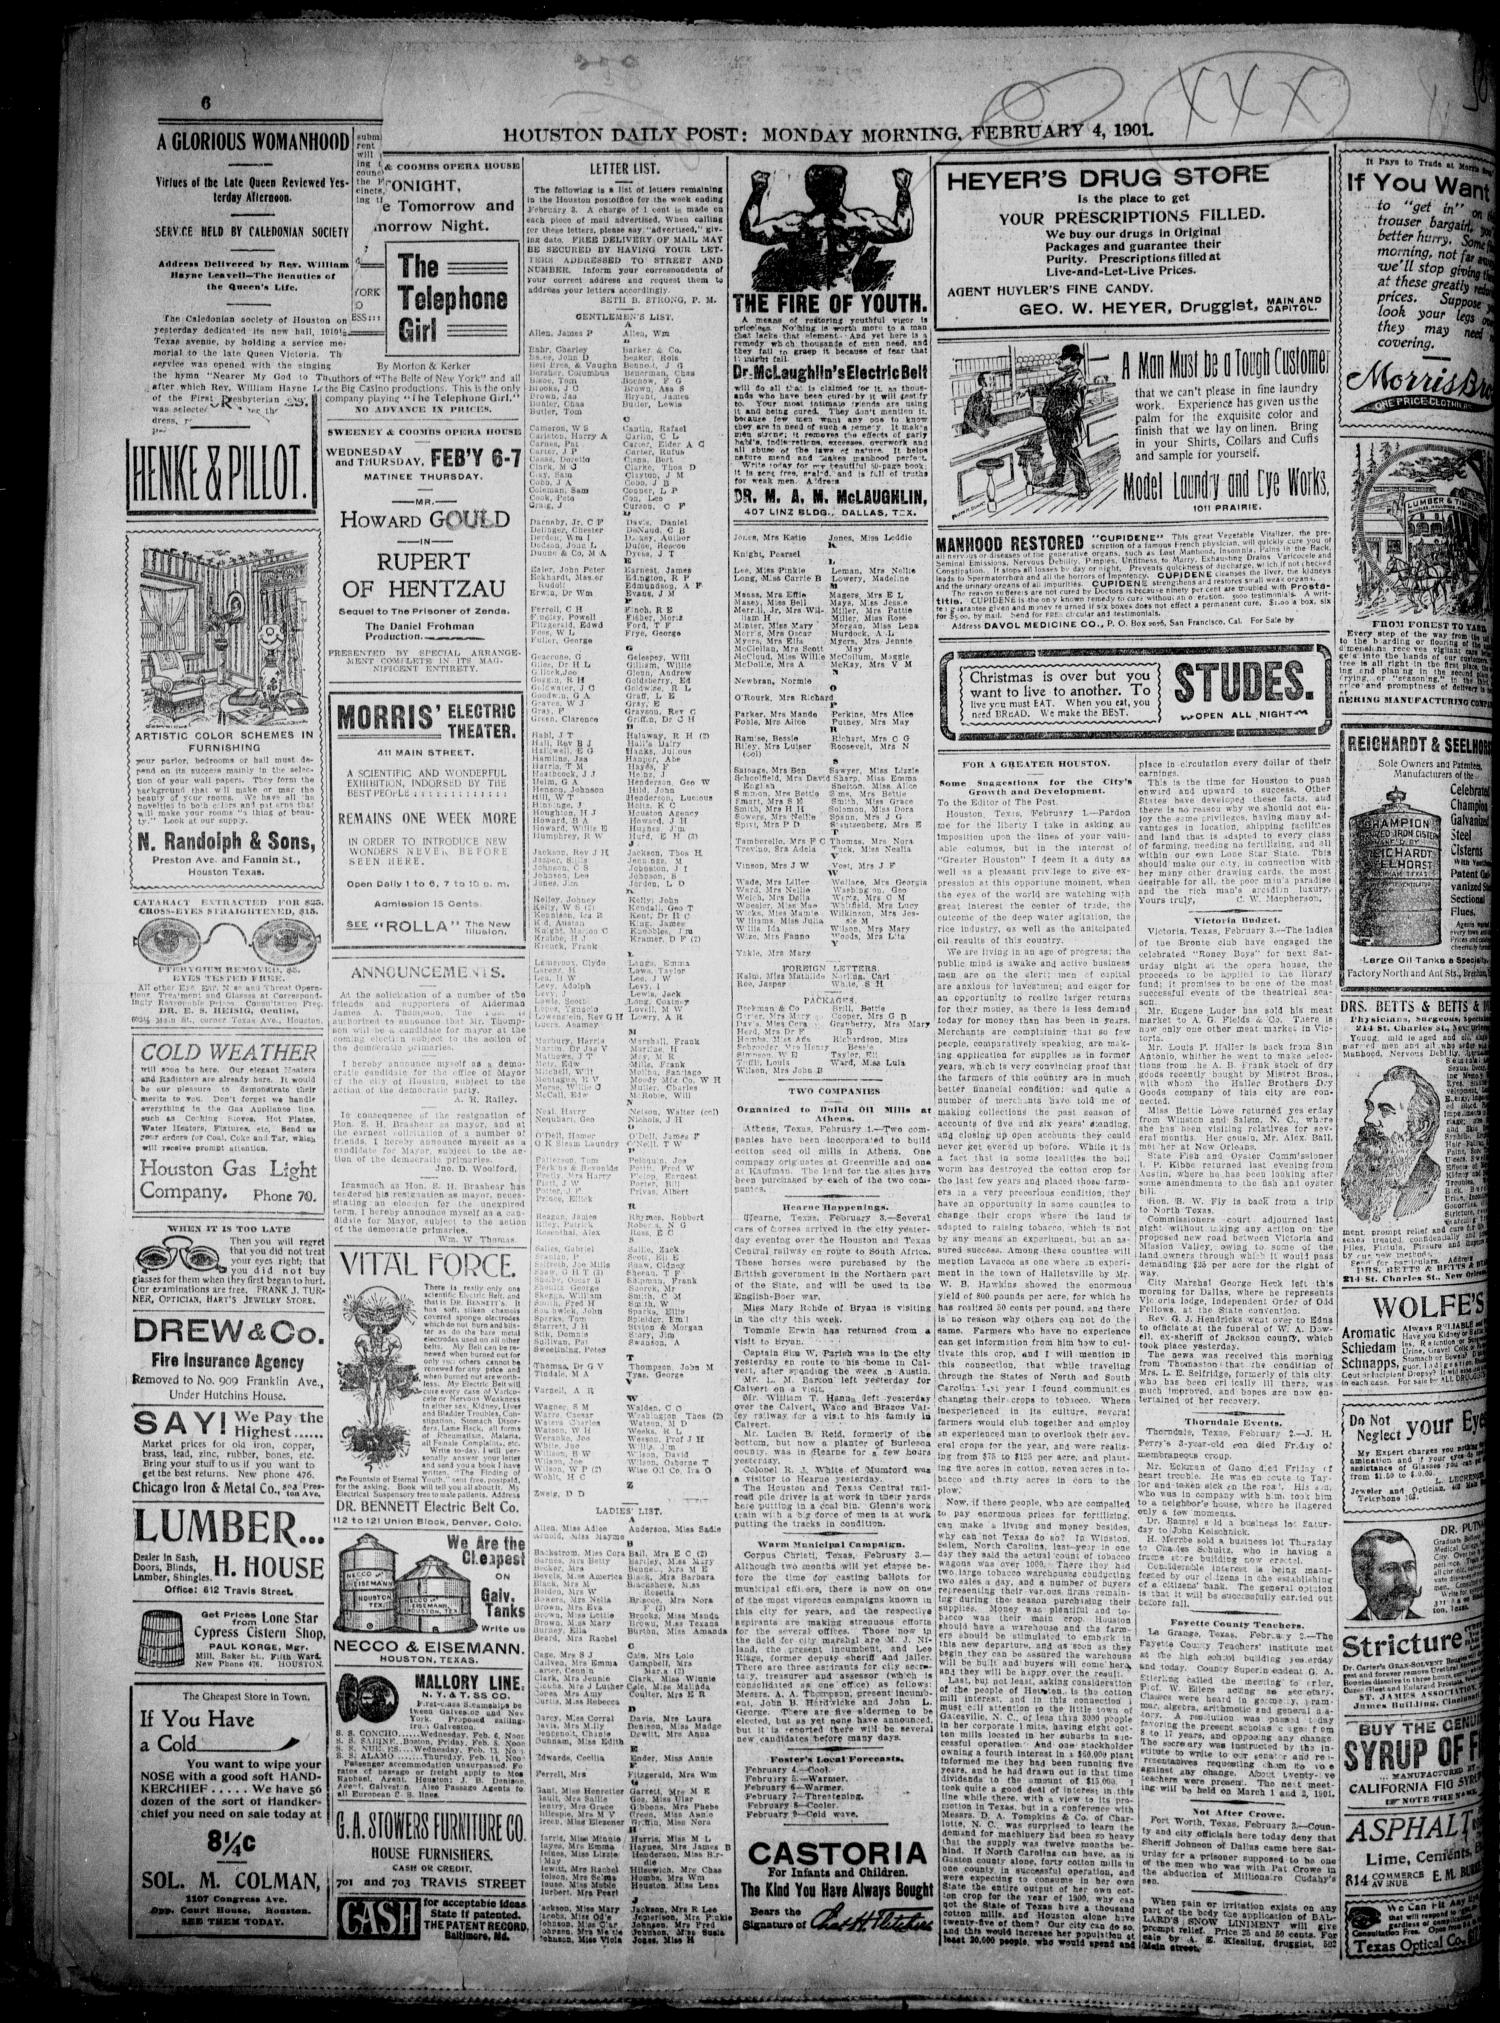 The Houston Daily Post (Houston, Tex ), Vol  XVIth YEAR, No